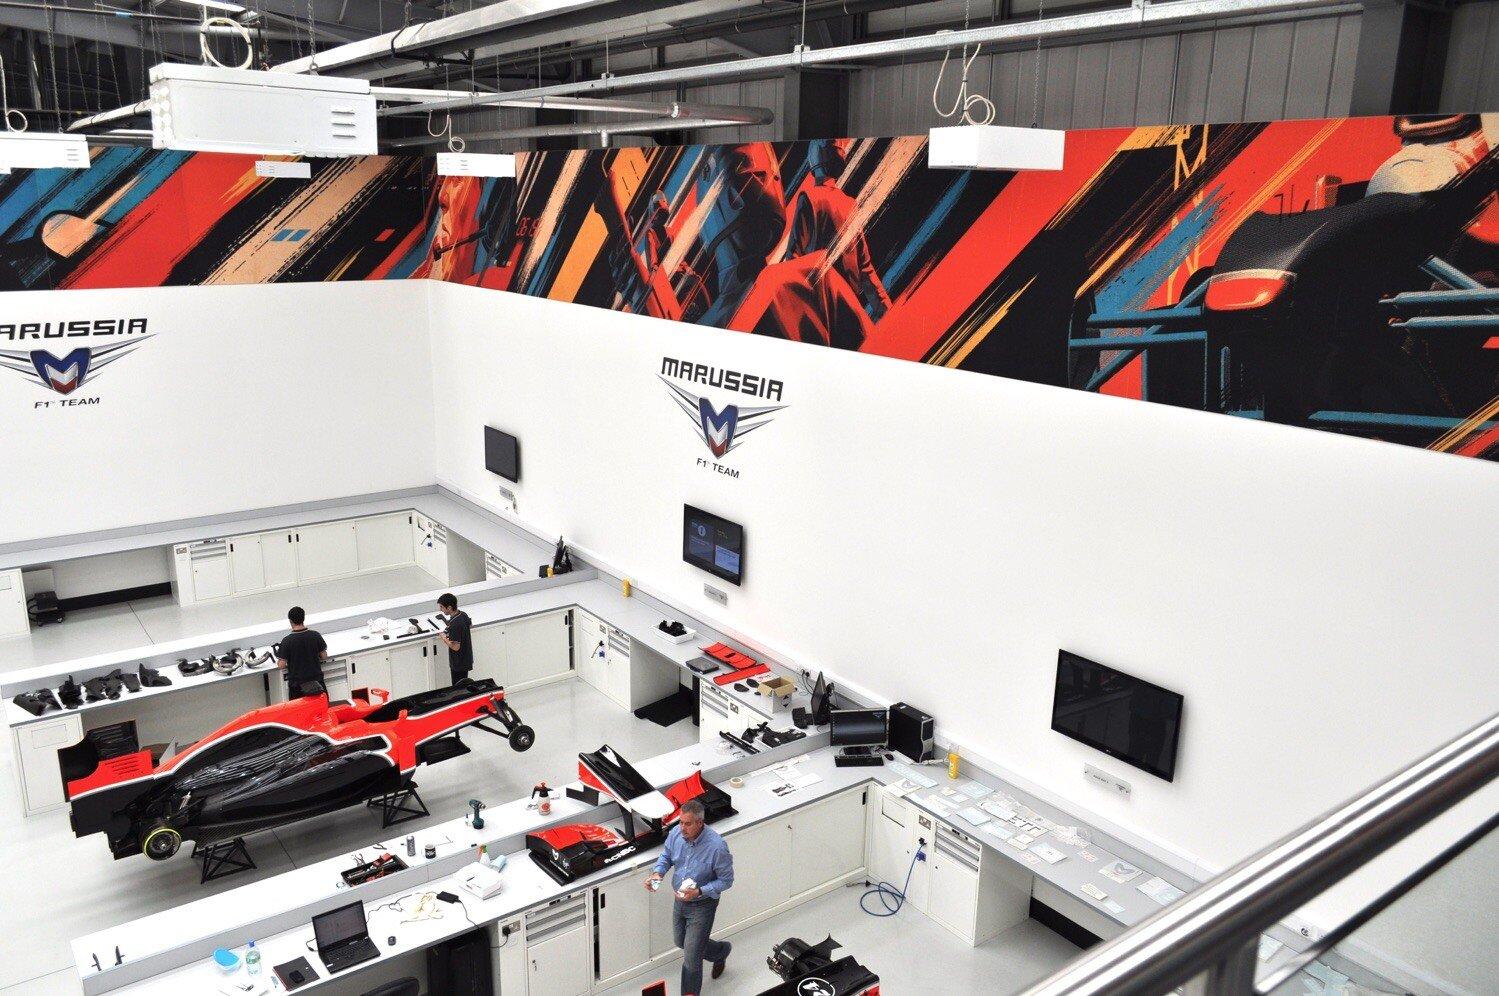 tavis-coburn-F1-team-graphic-illustration-marussia-30.jpg